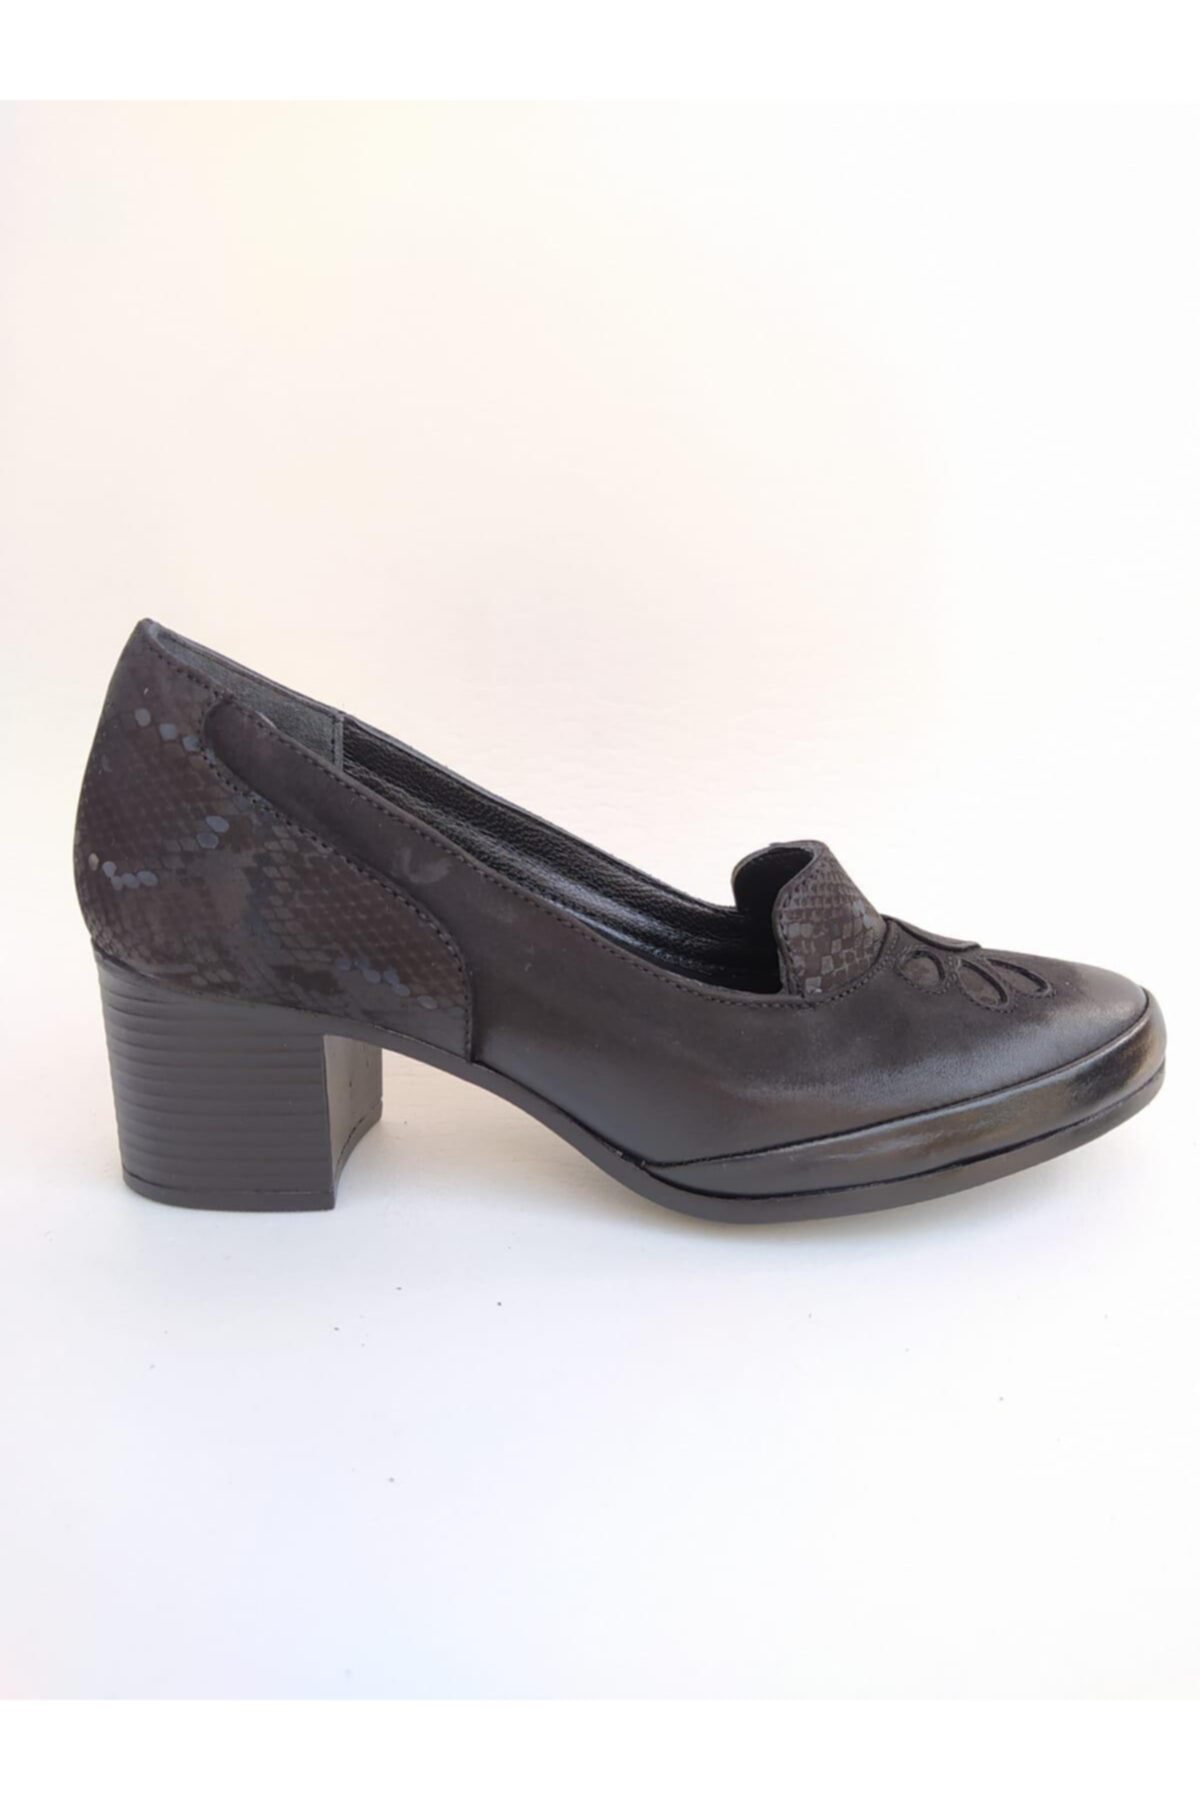 Venüs Kadın Siyah Topuklu Orjinal Deri Ayakkabı 1911922k 1